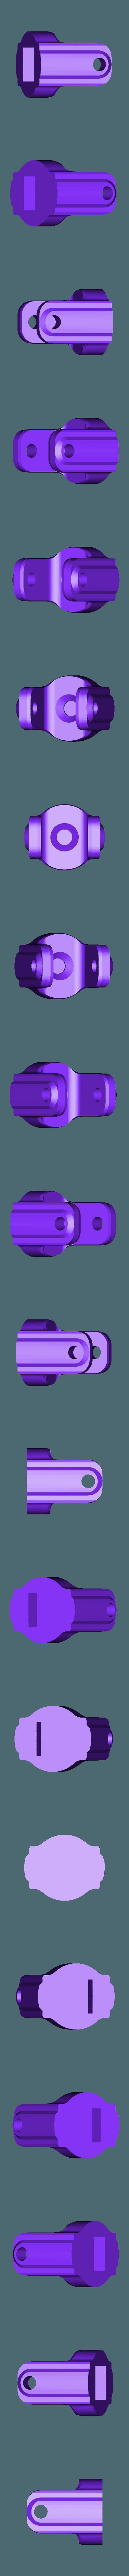 TruckV3_Axle_front_U-joint1x2.STL Download STL file 3D Printed RC Truck V3 • 3D print model, MrCrankyface